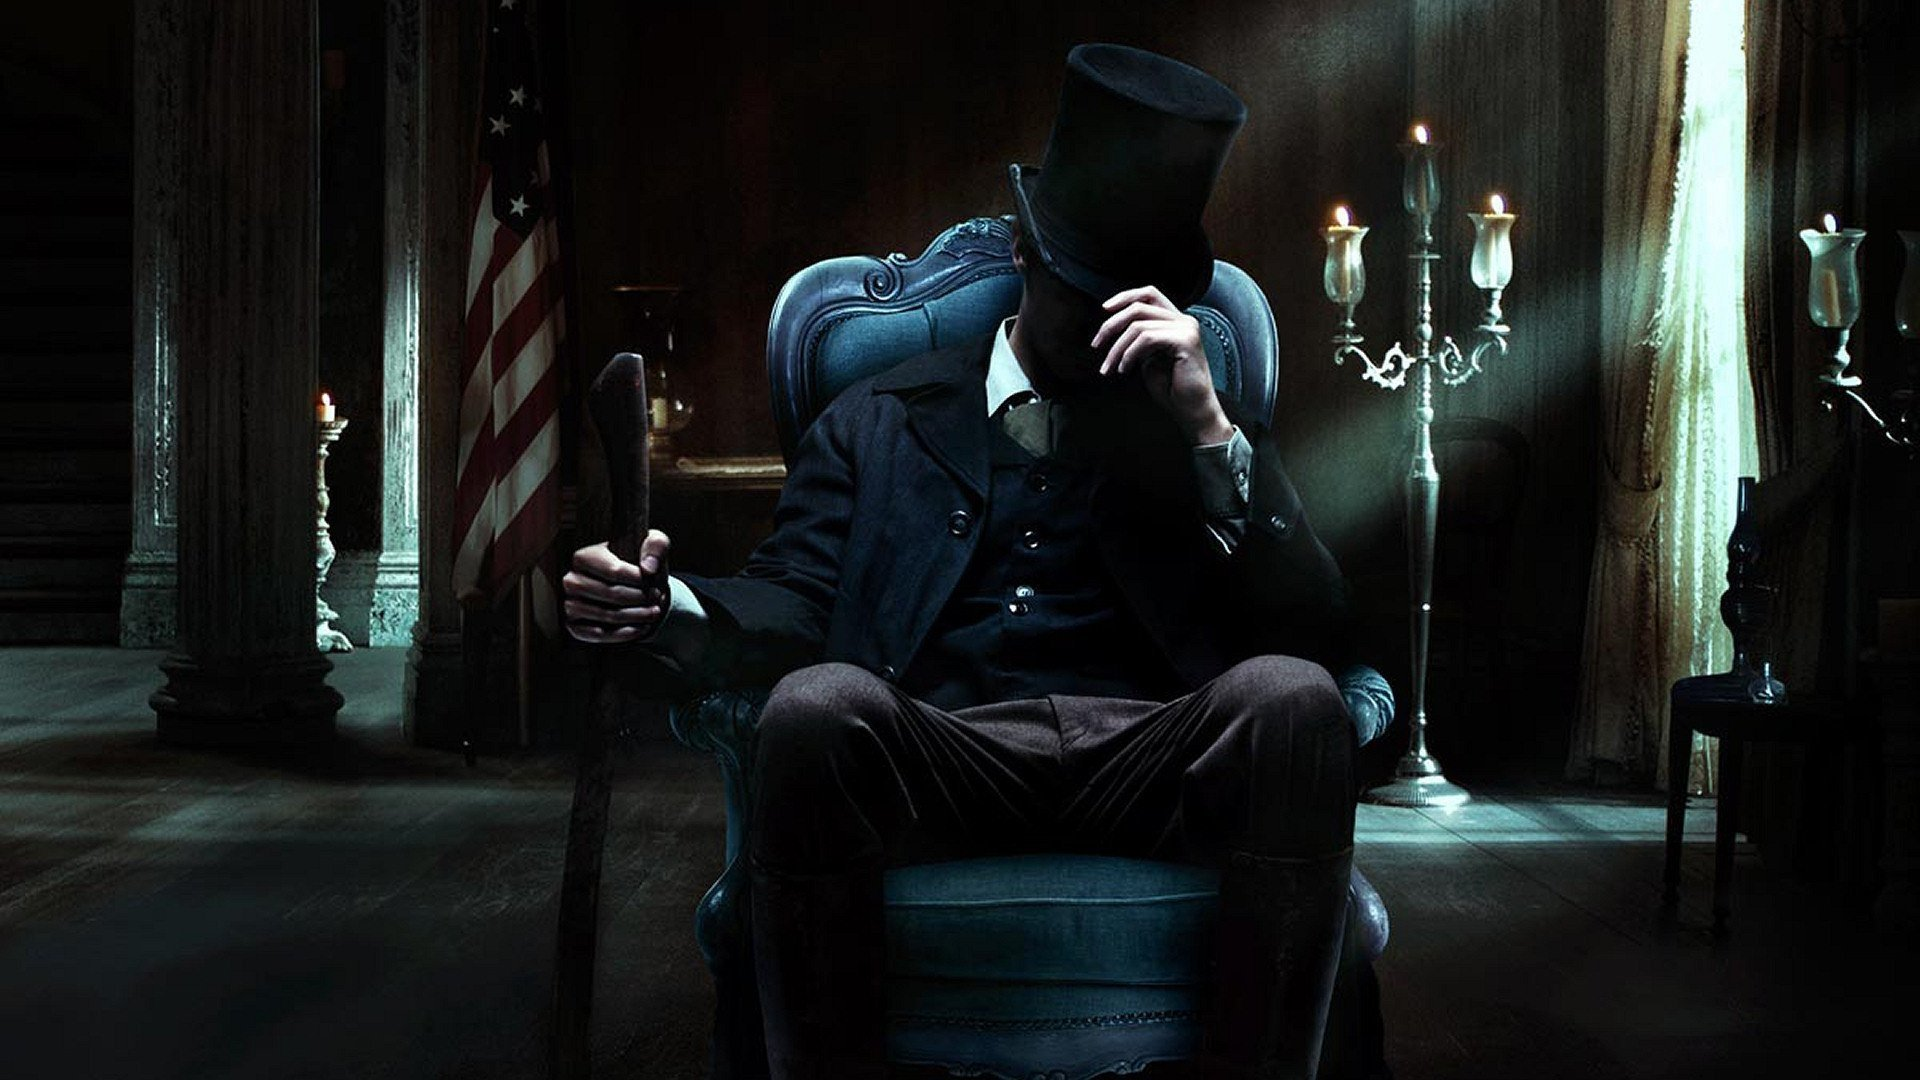 Abraham Lincoln Vampire Hunter Full HD Wallpaper and 1920x1080